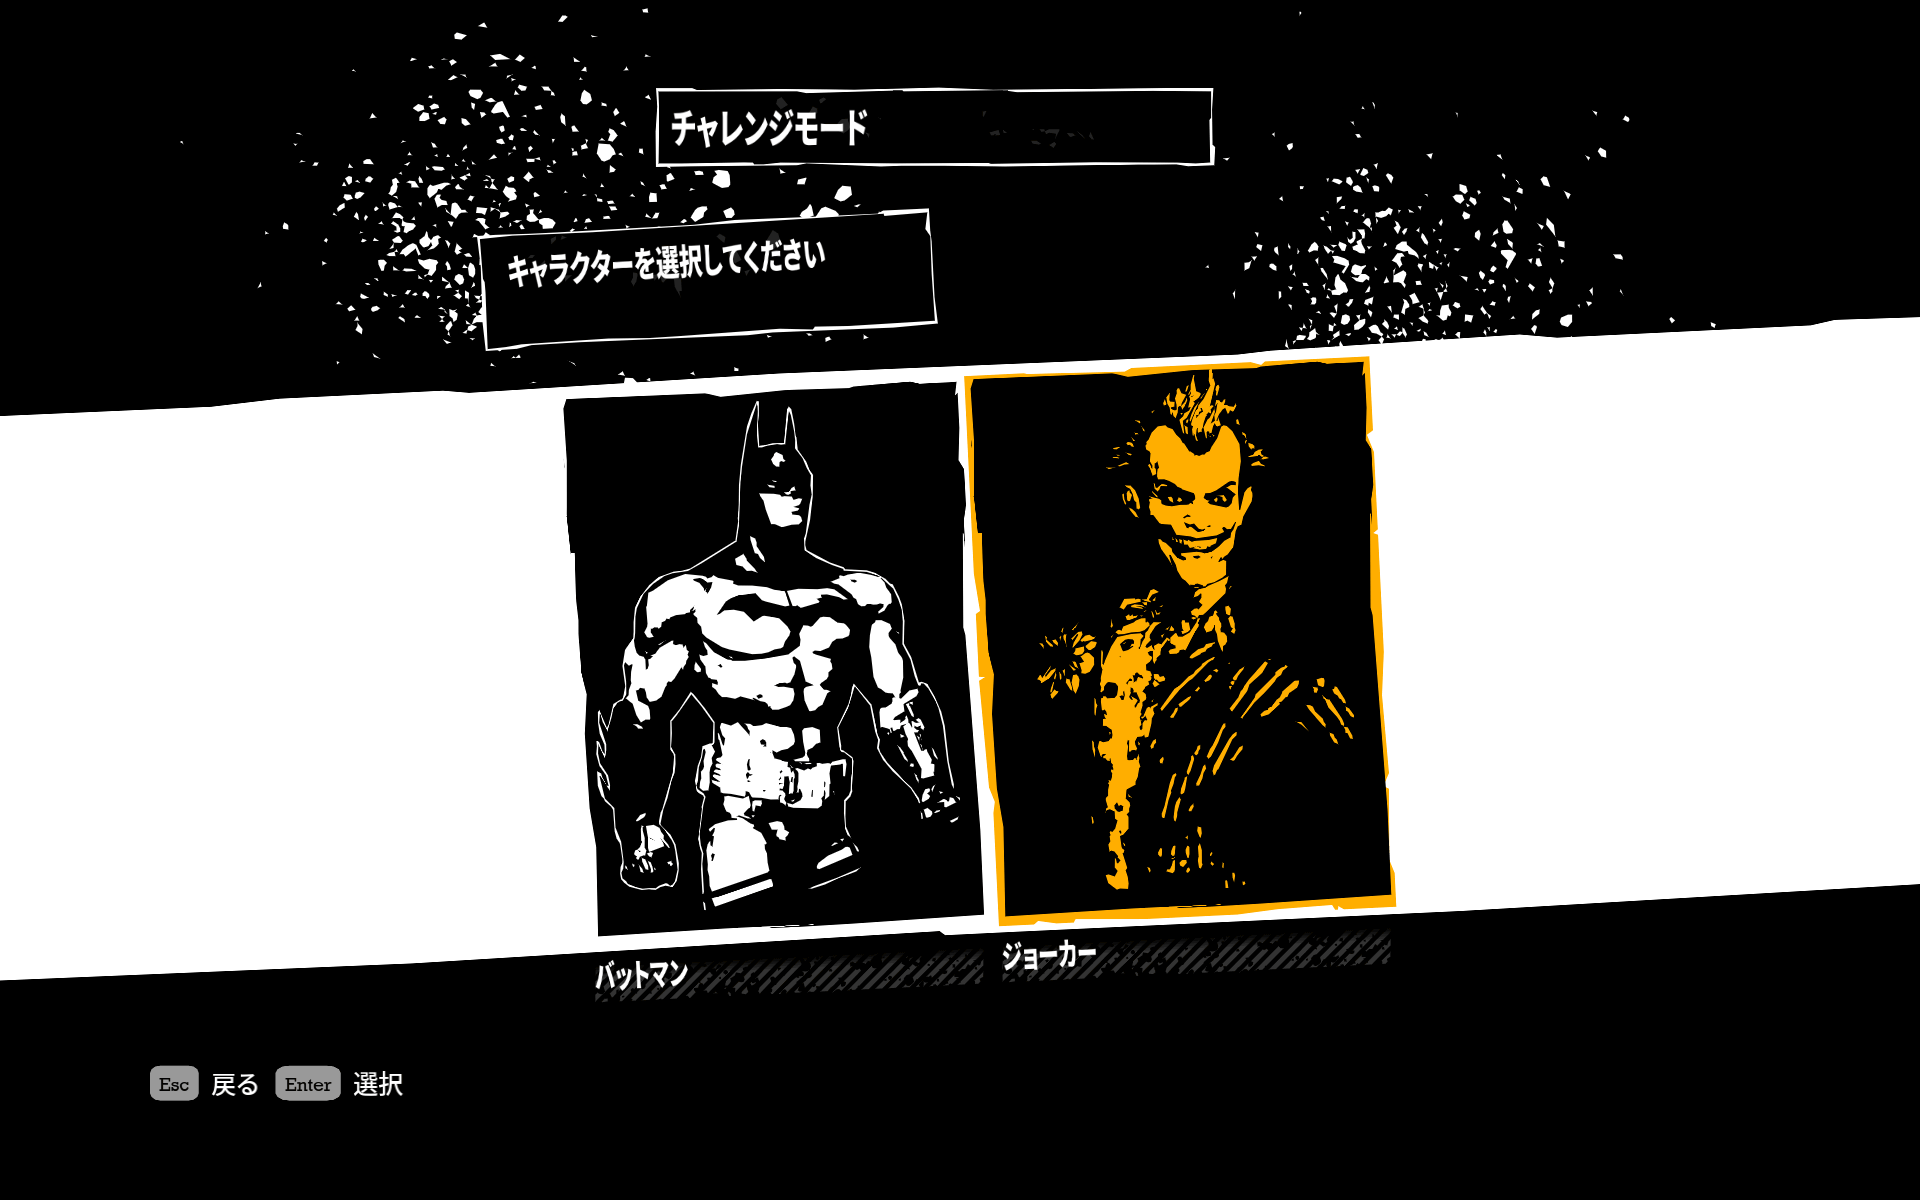 PC ゲーム Batman: Arkham Asylum GOTY Edition 日本語化とゲームプレイ最適化メモ、PS3 Joker(ジョーカー) DLC + チャレンジマップ Prey In The Darkness(暗闇の餌食) Mod 導入後スクリーンショット、チャレンジモード キャラクター選択画面